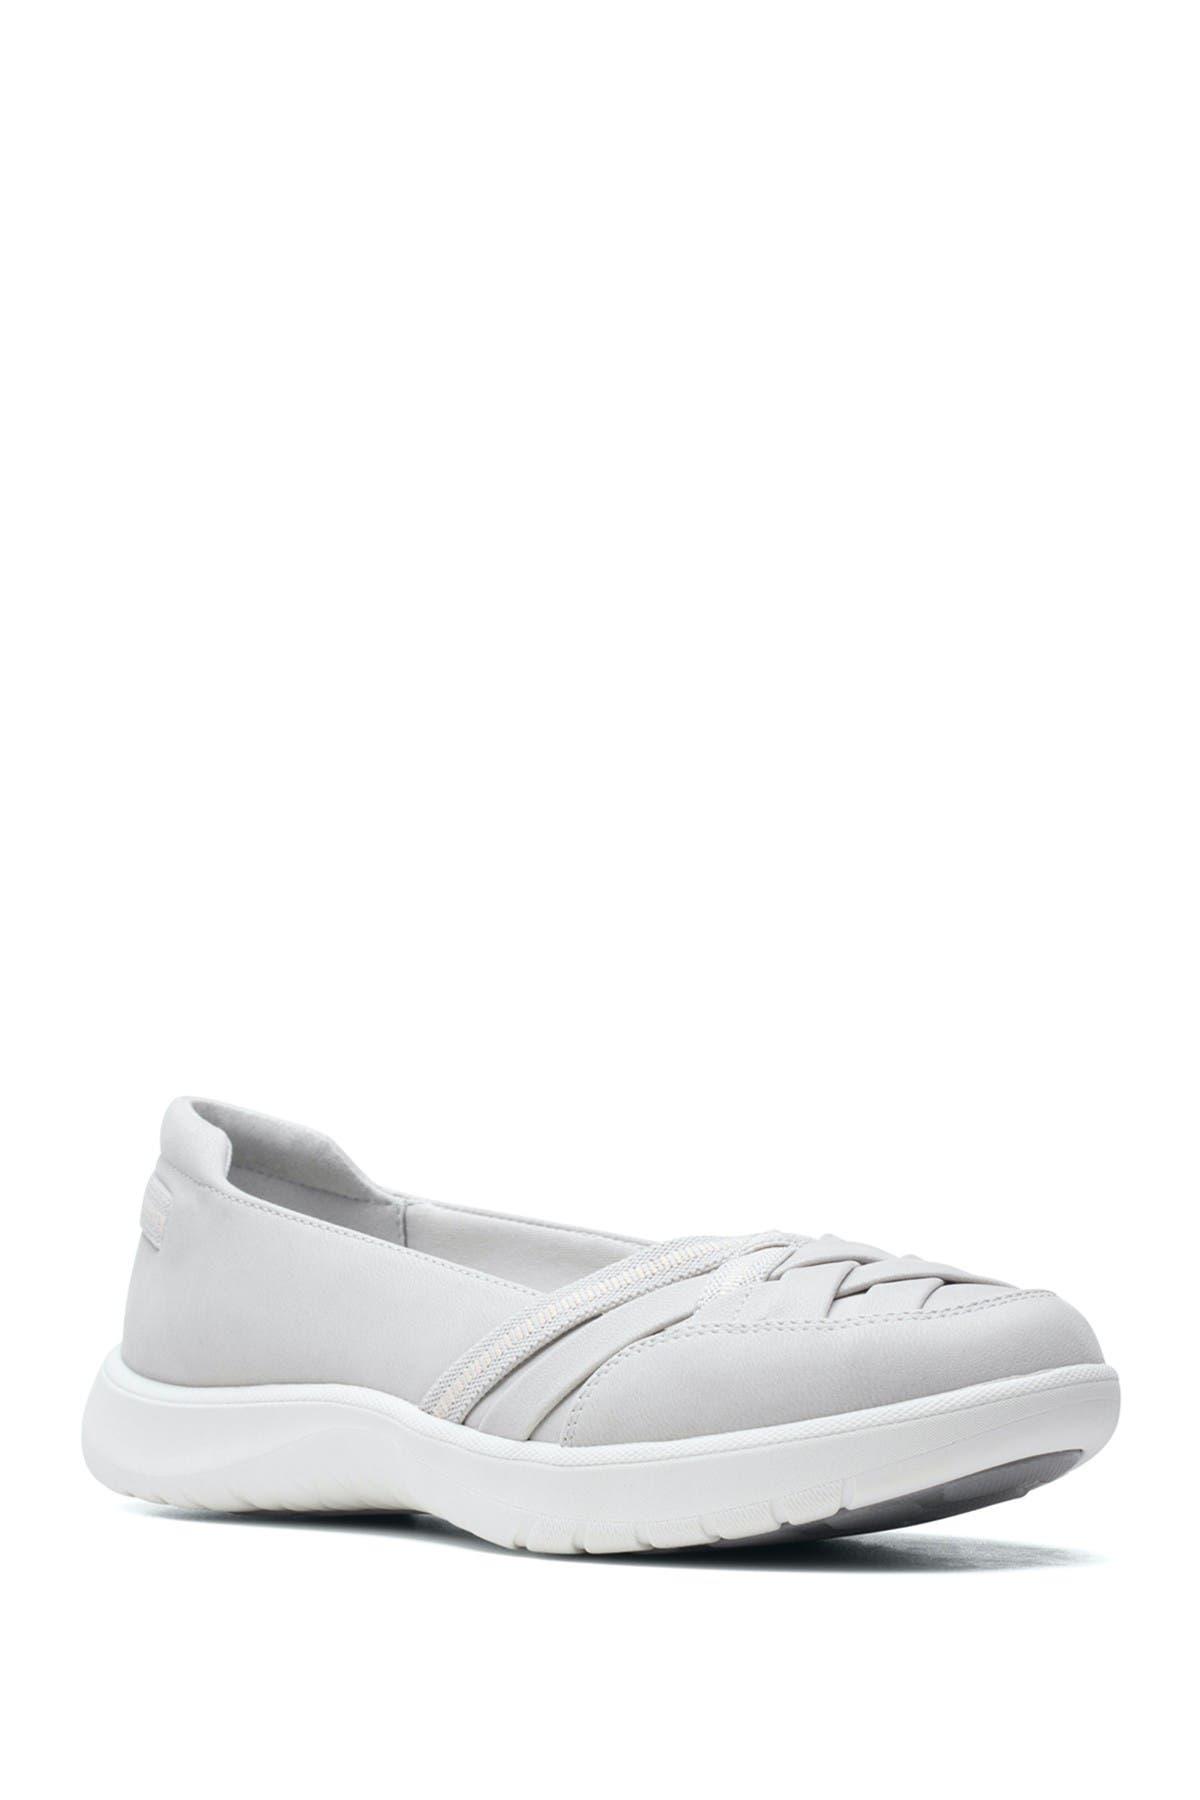 Image of Clarks Adella Poppy Slip-On Sneaker - Wide Width Available